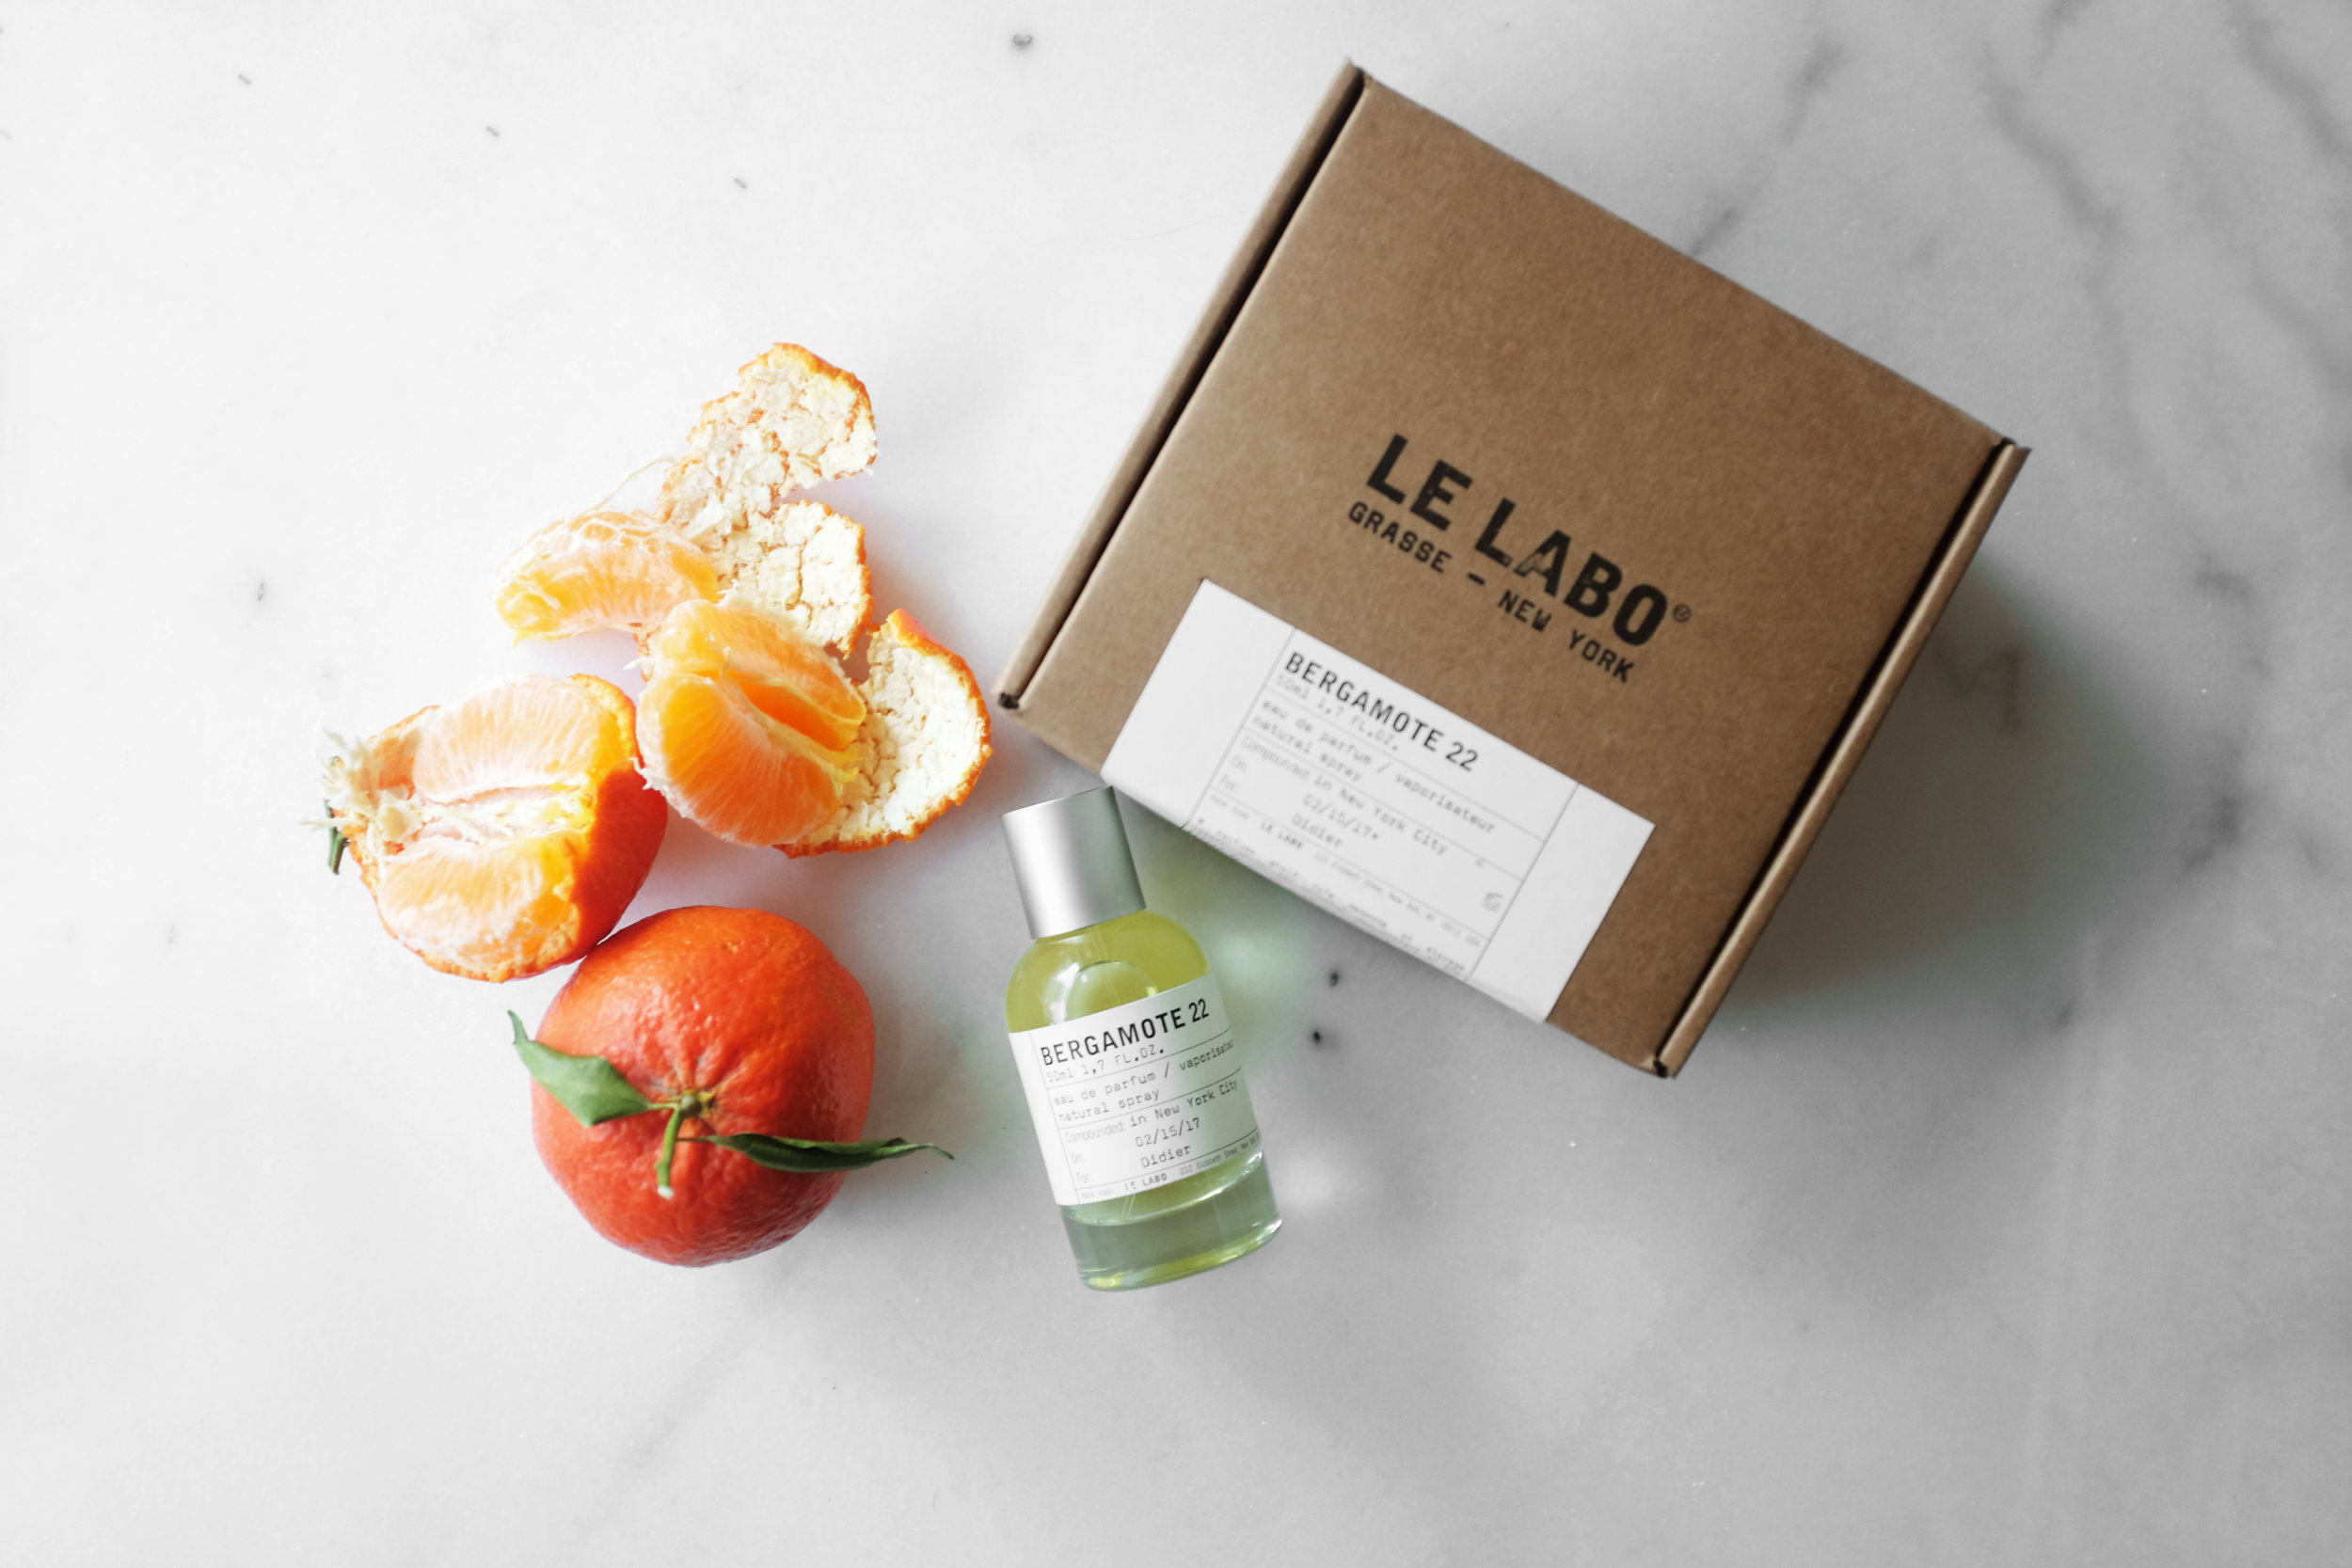 Le Labo's Bergamotte 22 makes for the perfect citrusy summer scent.